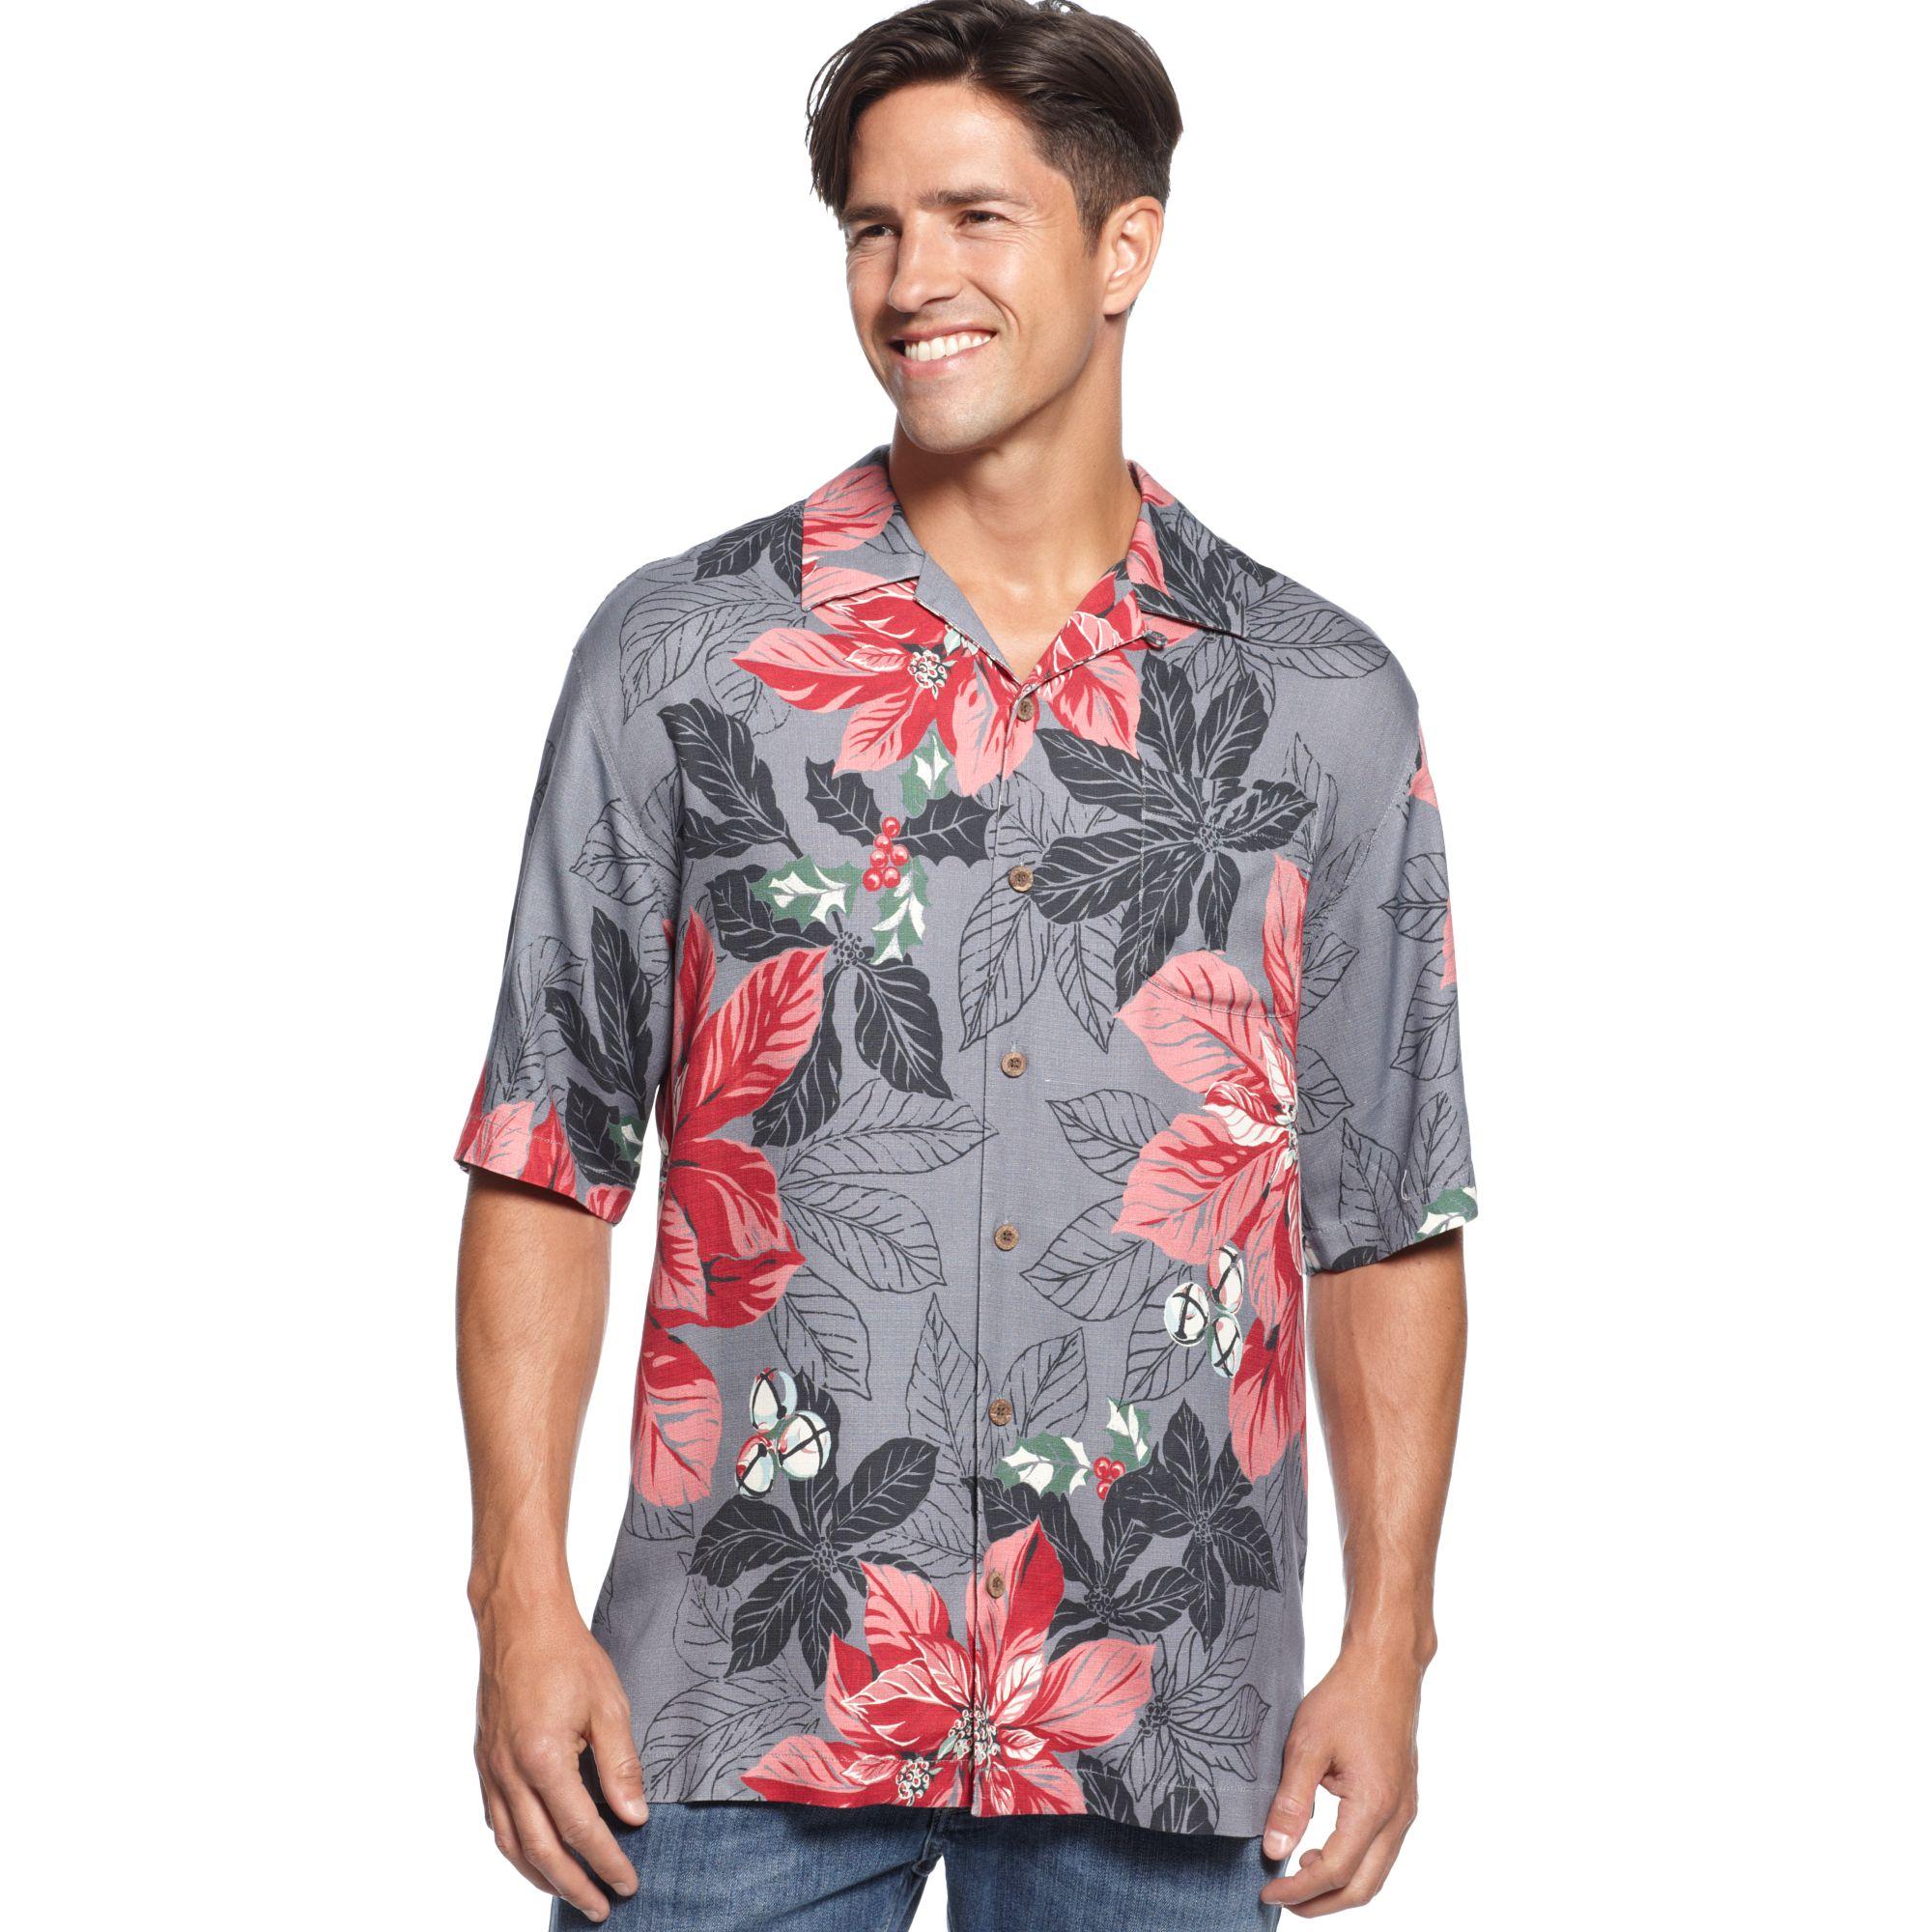 Lyst tommy bahama short sleeve half pipe holiday shirt for Tommy bahama christmas shirt 2014